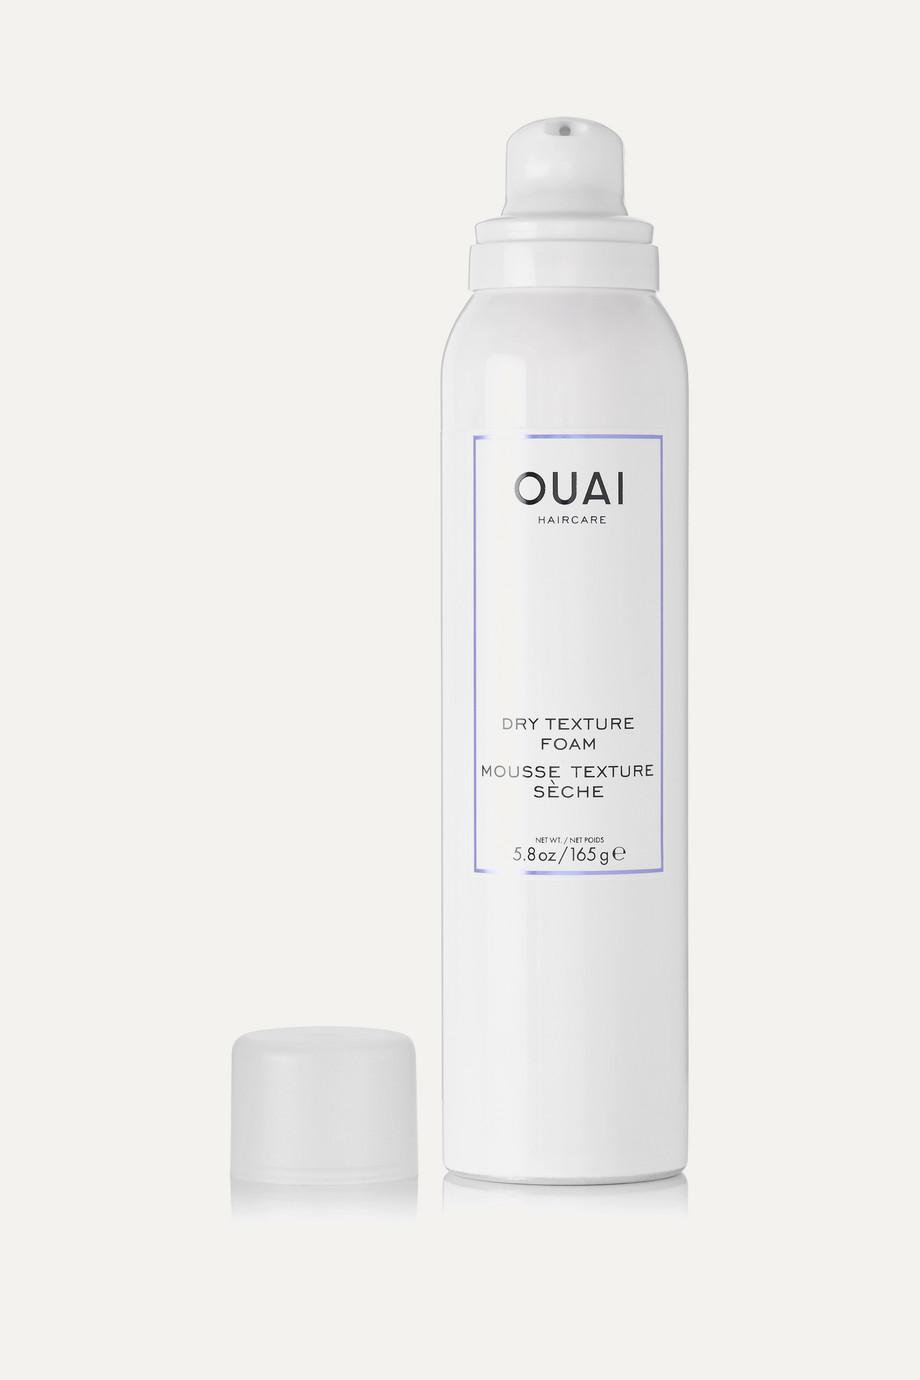 OUAI Haircare Dry Texture Foam, 165g